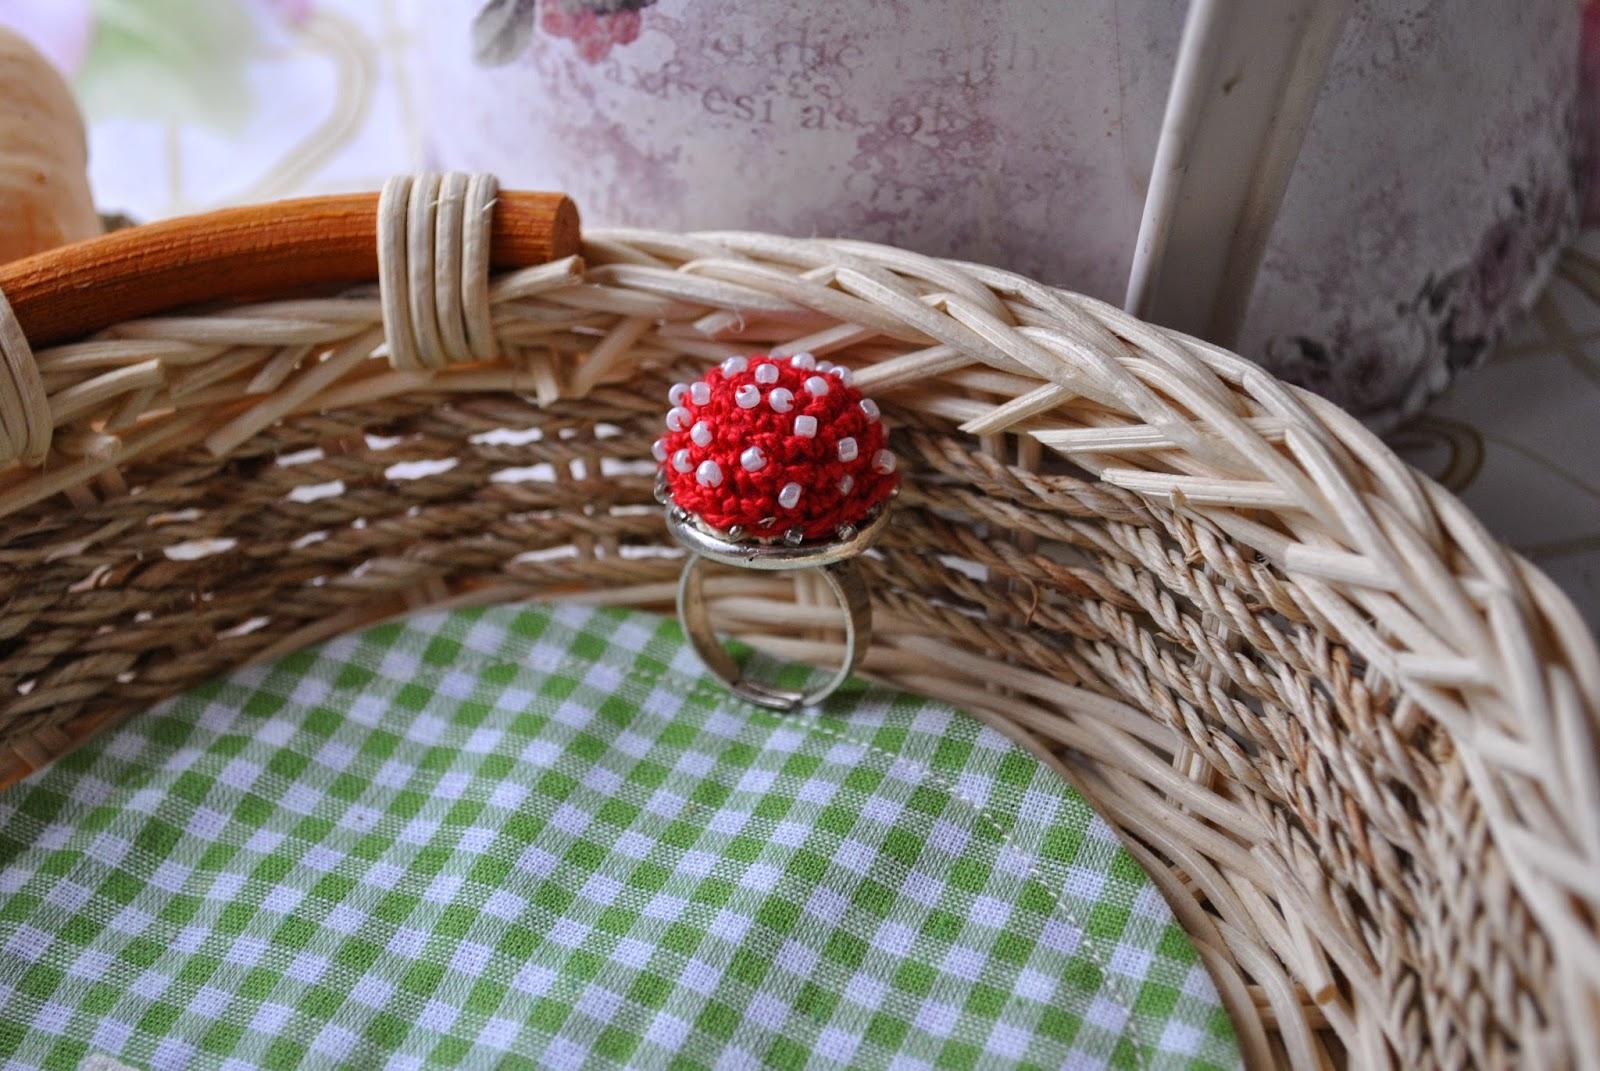 кольцо, гриб, мухомор, бисерное кольцо